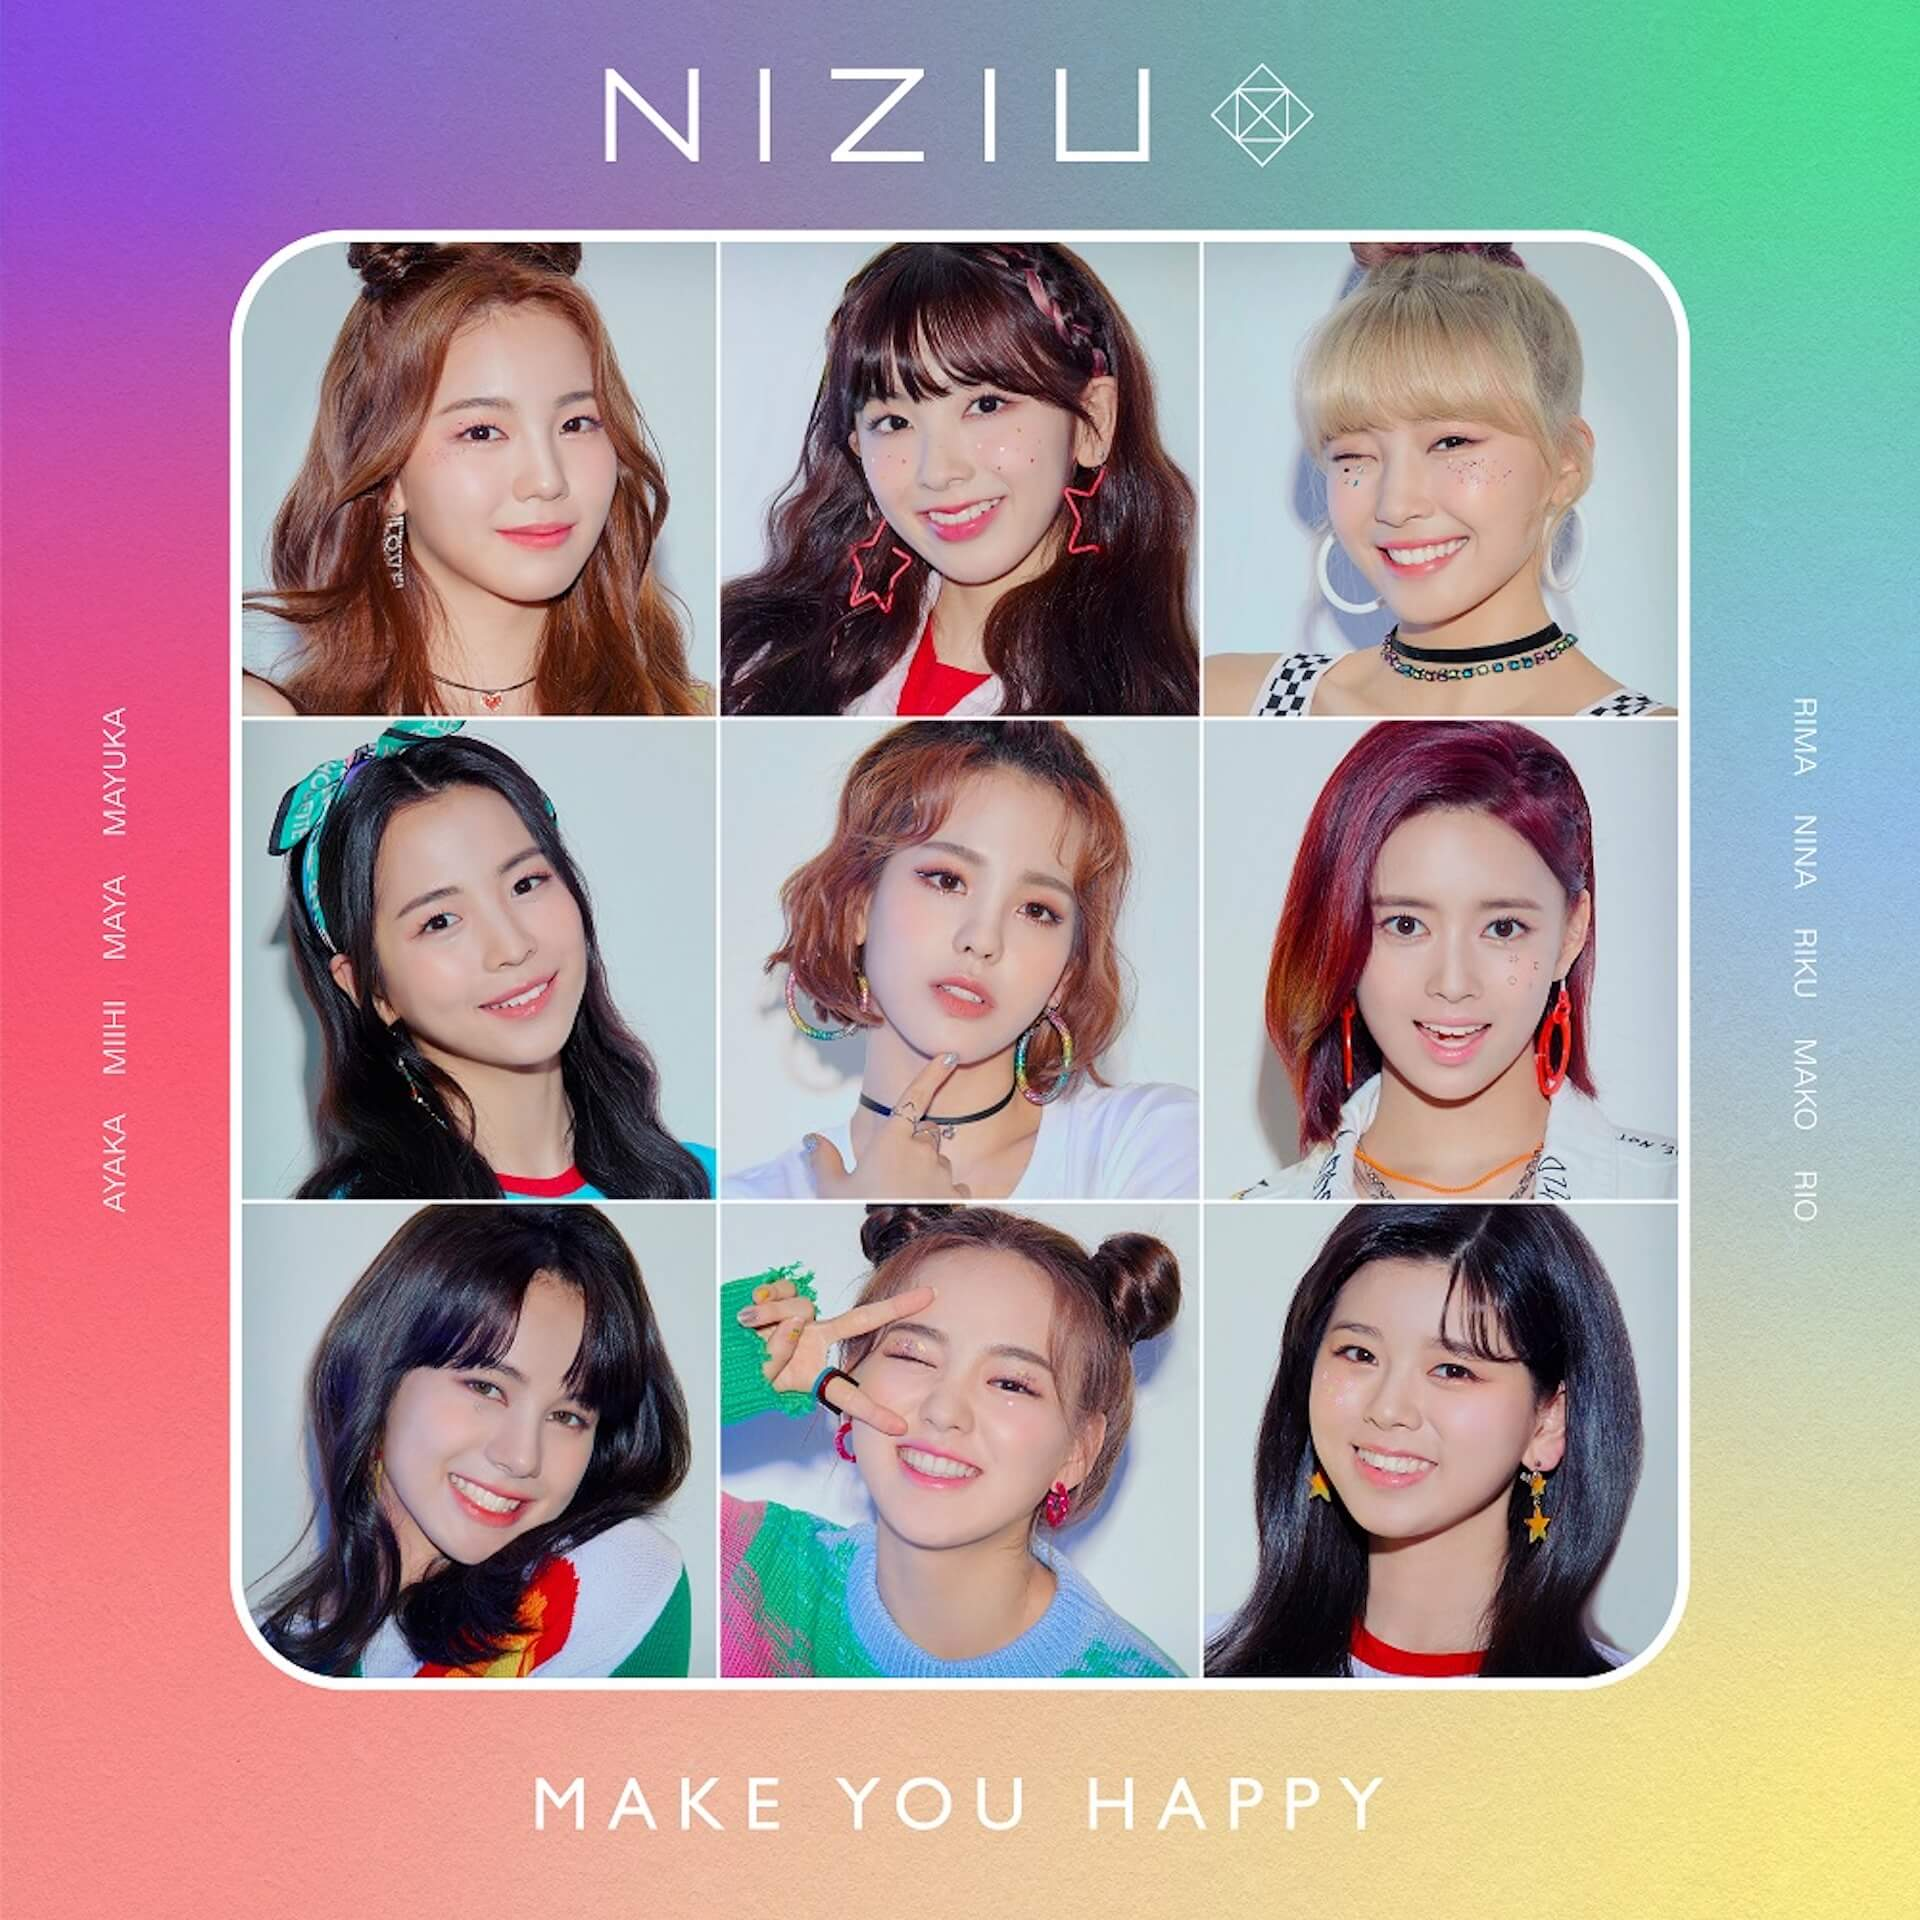 NiziU、デビュー後わずか29日で『NHK紅白歌合戦』に初出場決定!初紅白決定にMAKO「2020年の最後にたくさんの思い出を作りたいです」 music201116_niziu_1